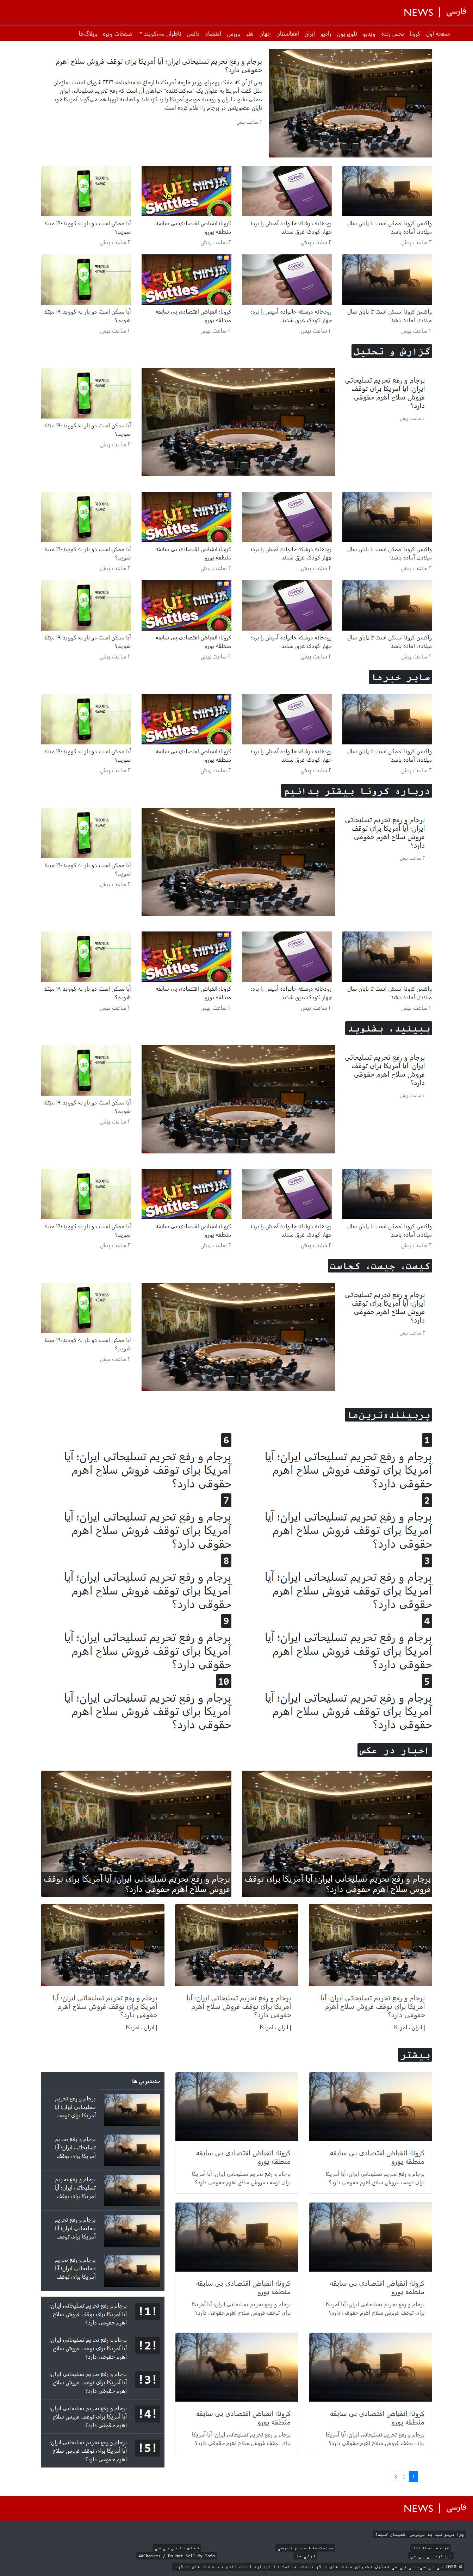 Screenshot_2020_05_02_BBC_Persian.jpg